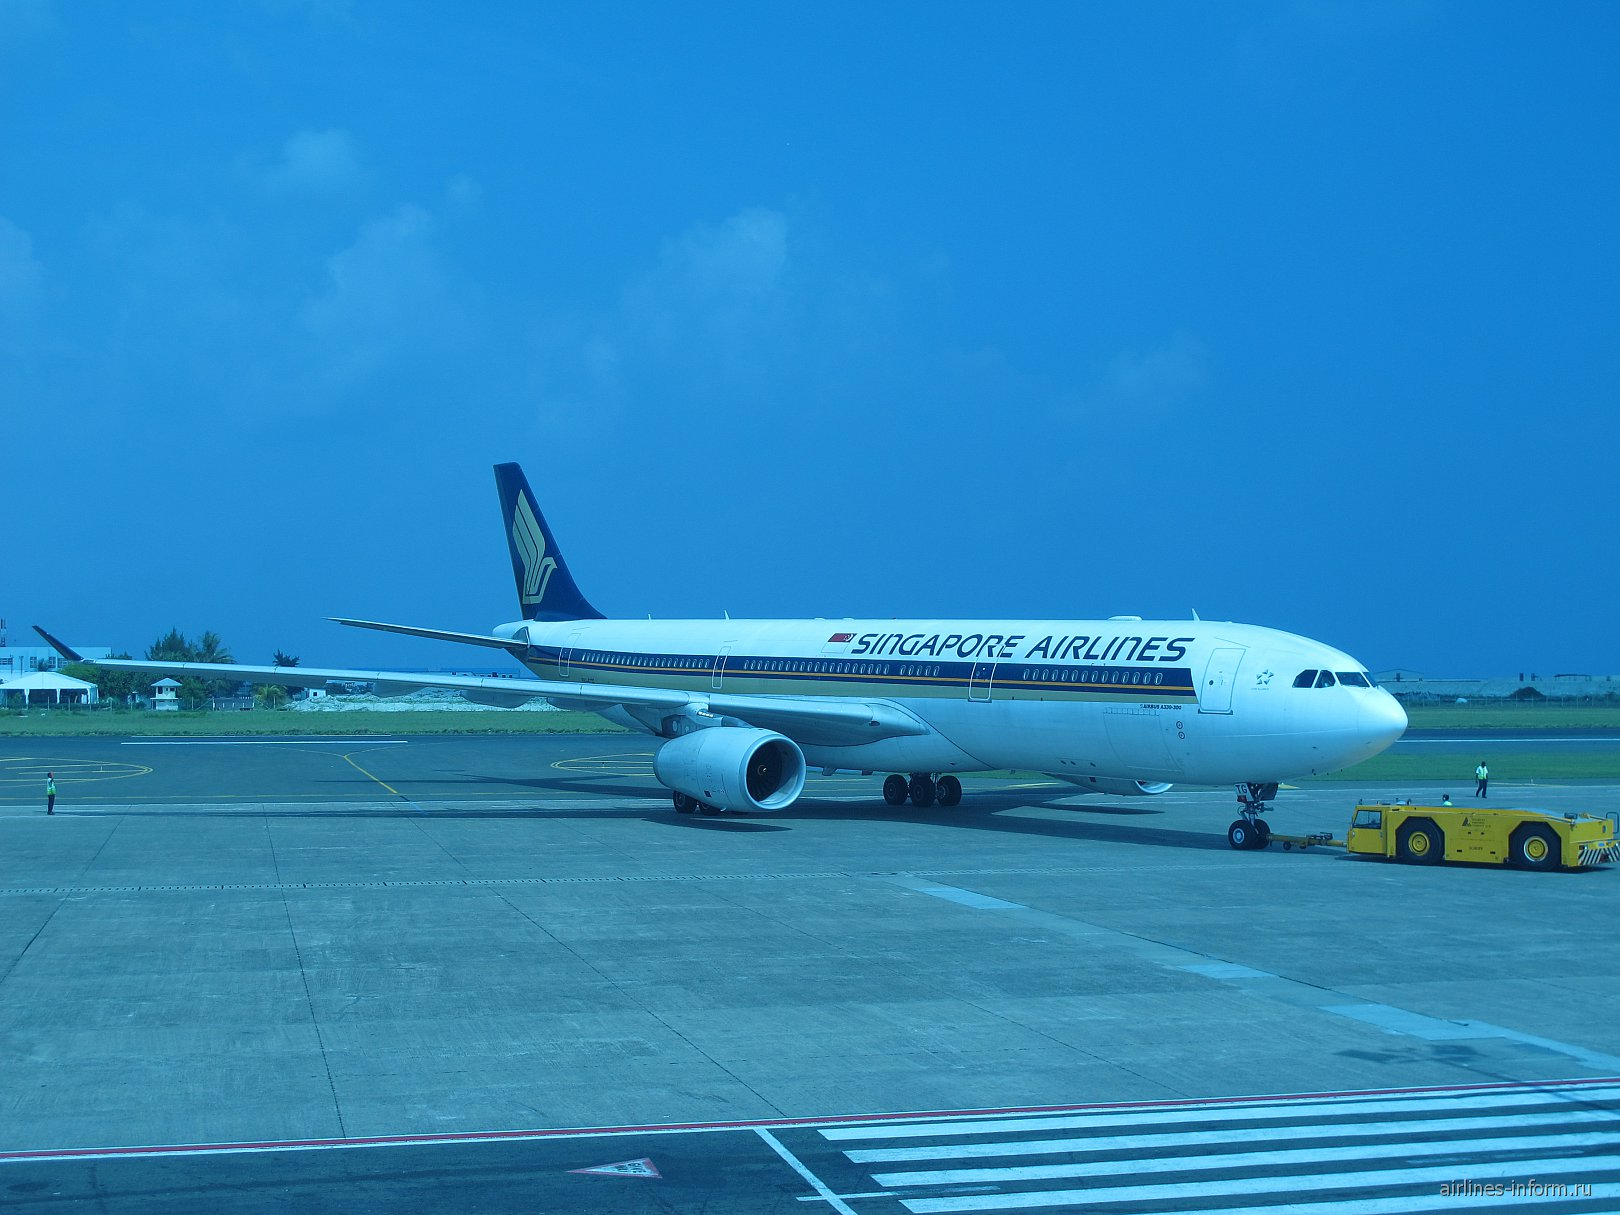 Airbus A330-300 Сингапурских авиалиний в аэропорту Мале